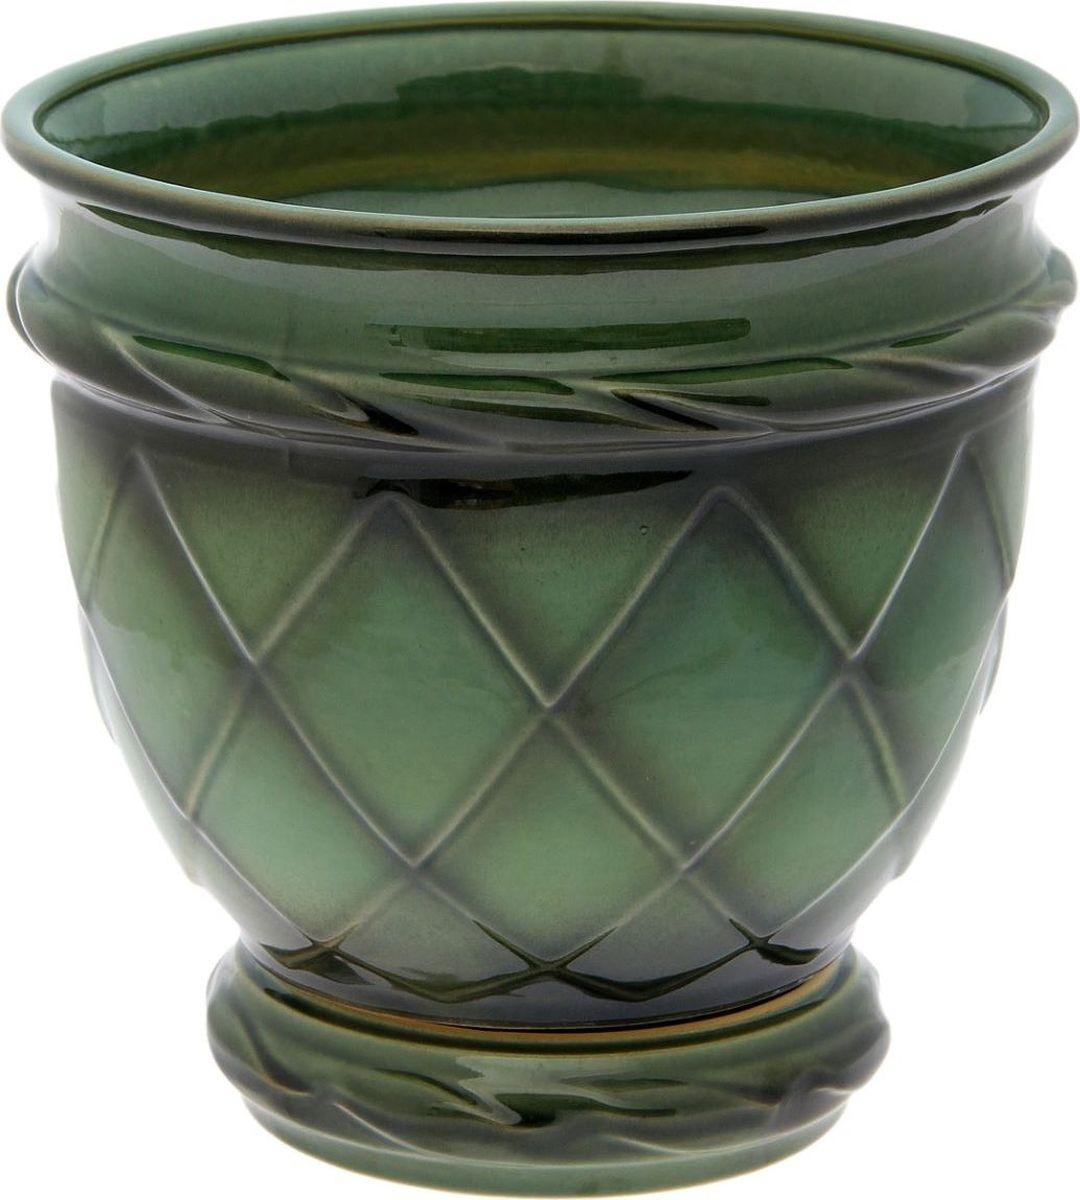 Кашпо Ромб, цвет: зеленый, 9 л839942